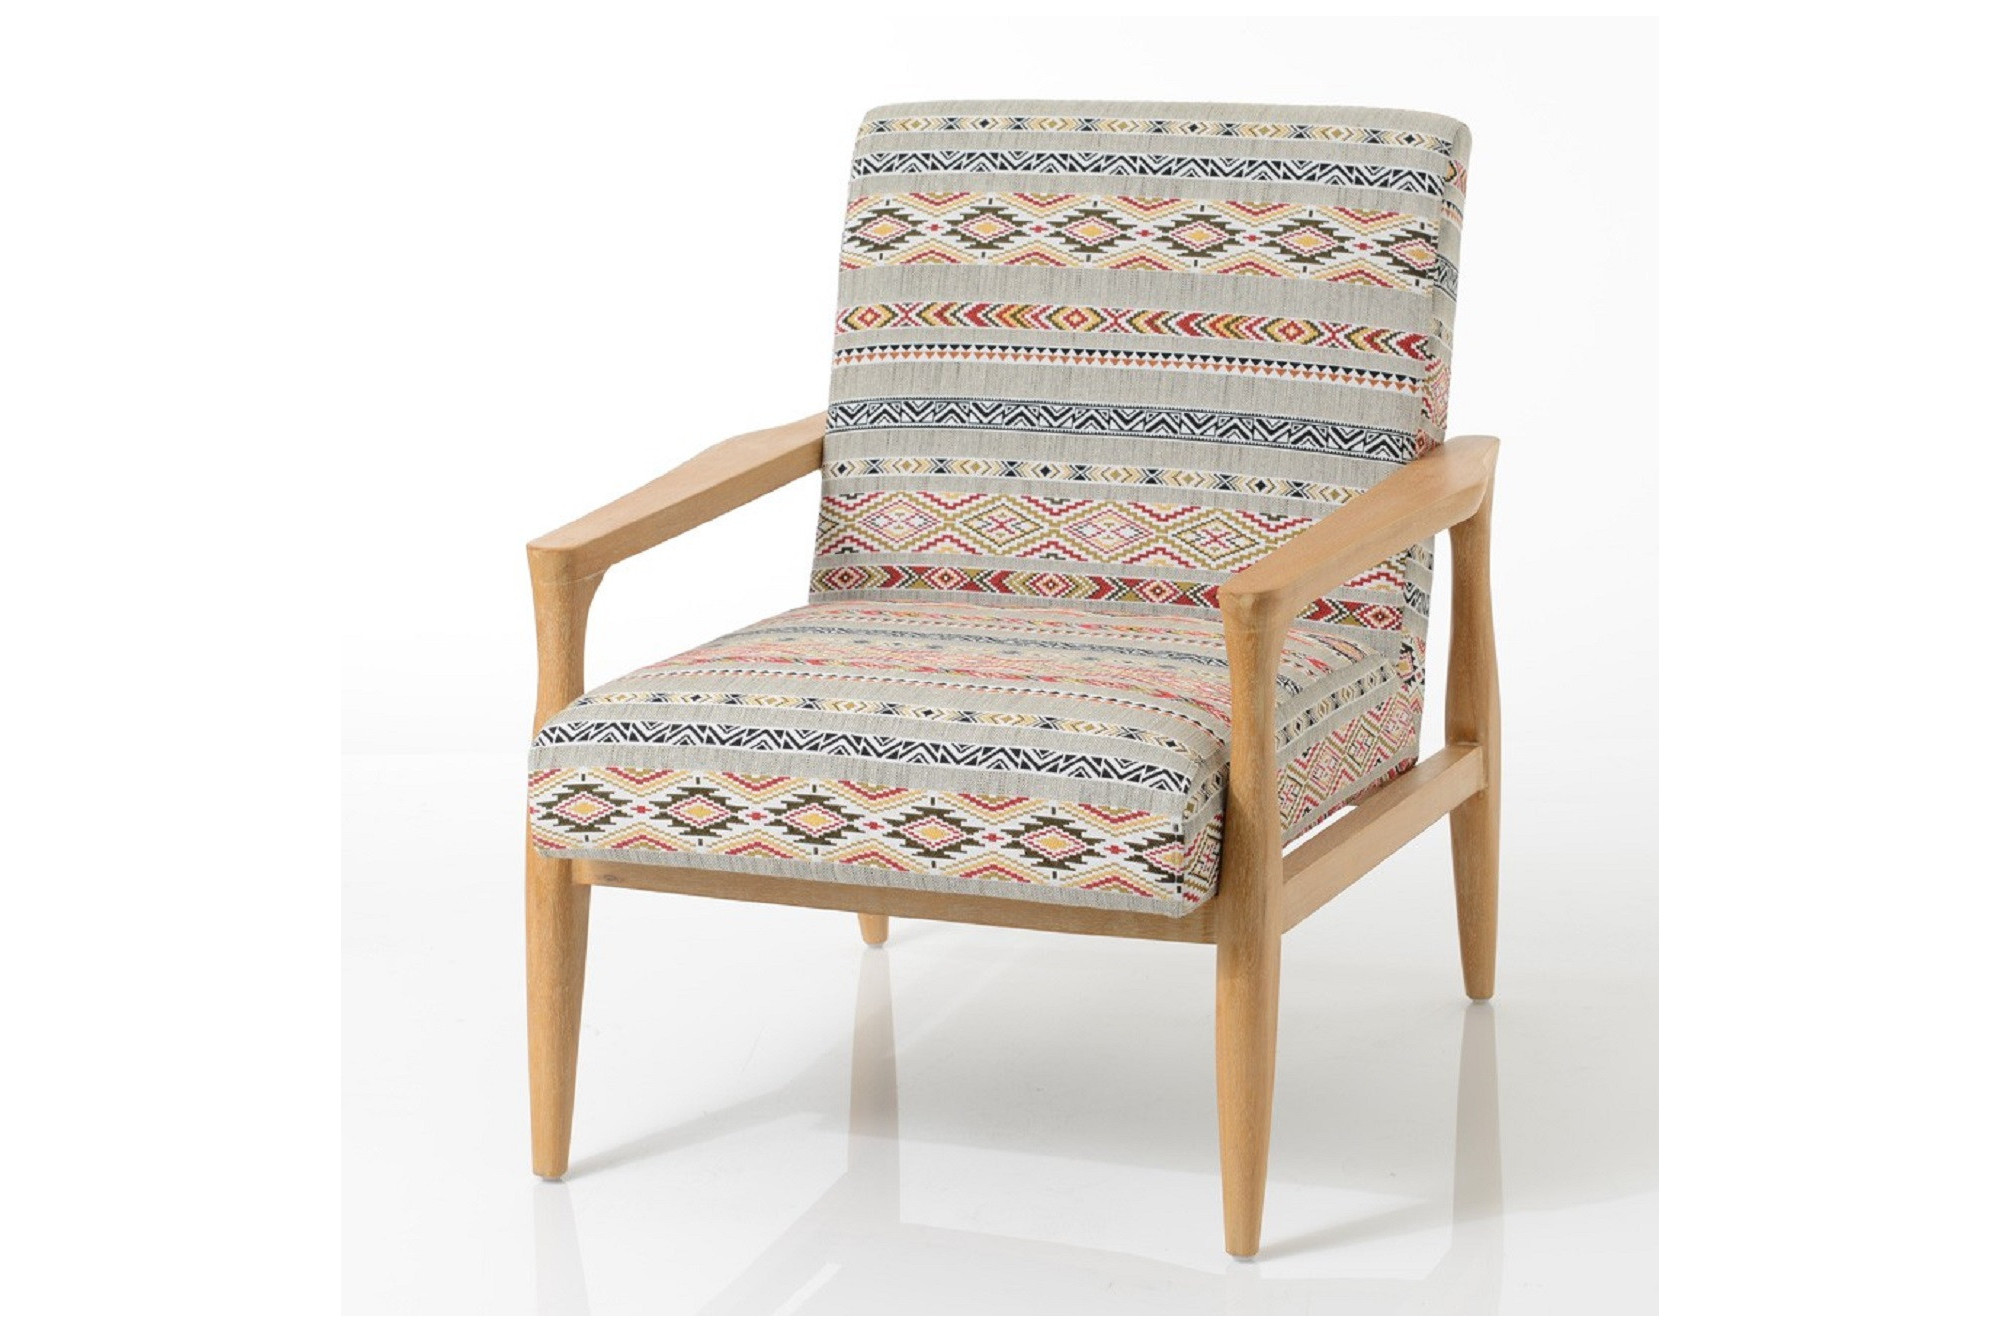 fauteuil en bois et tissu hindy hellin. Black Bedroom Furniture Sets. Home Design Ideas